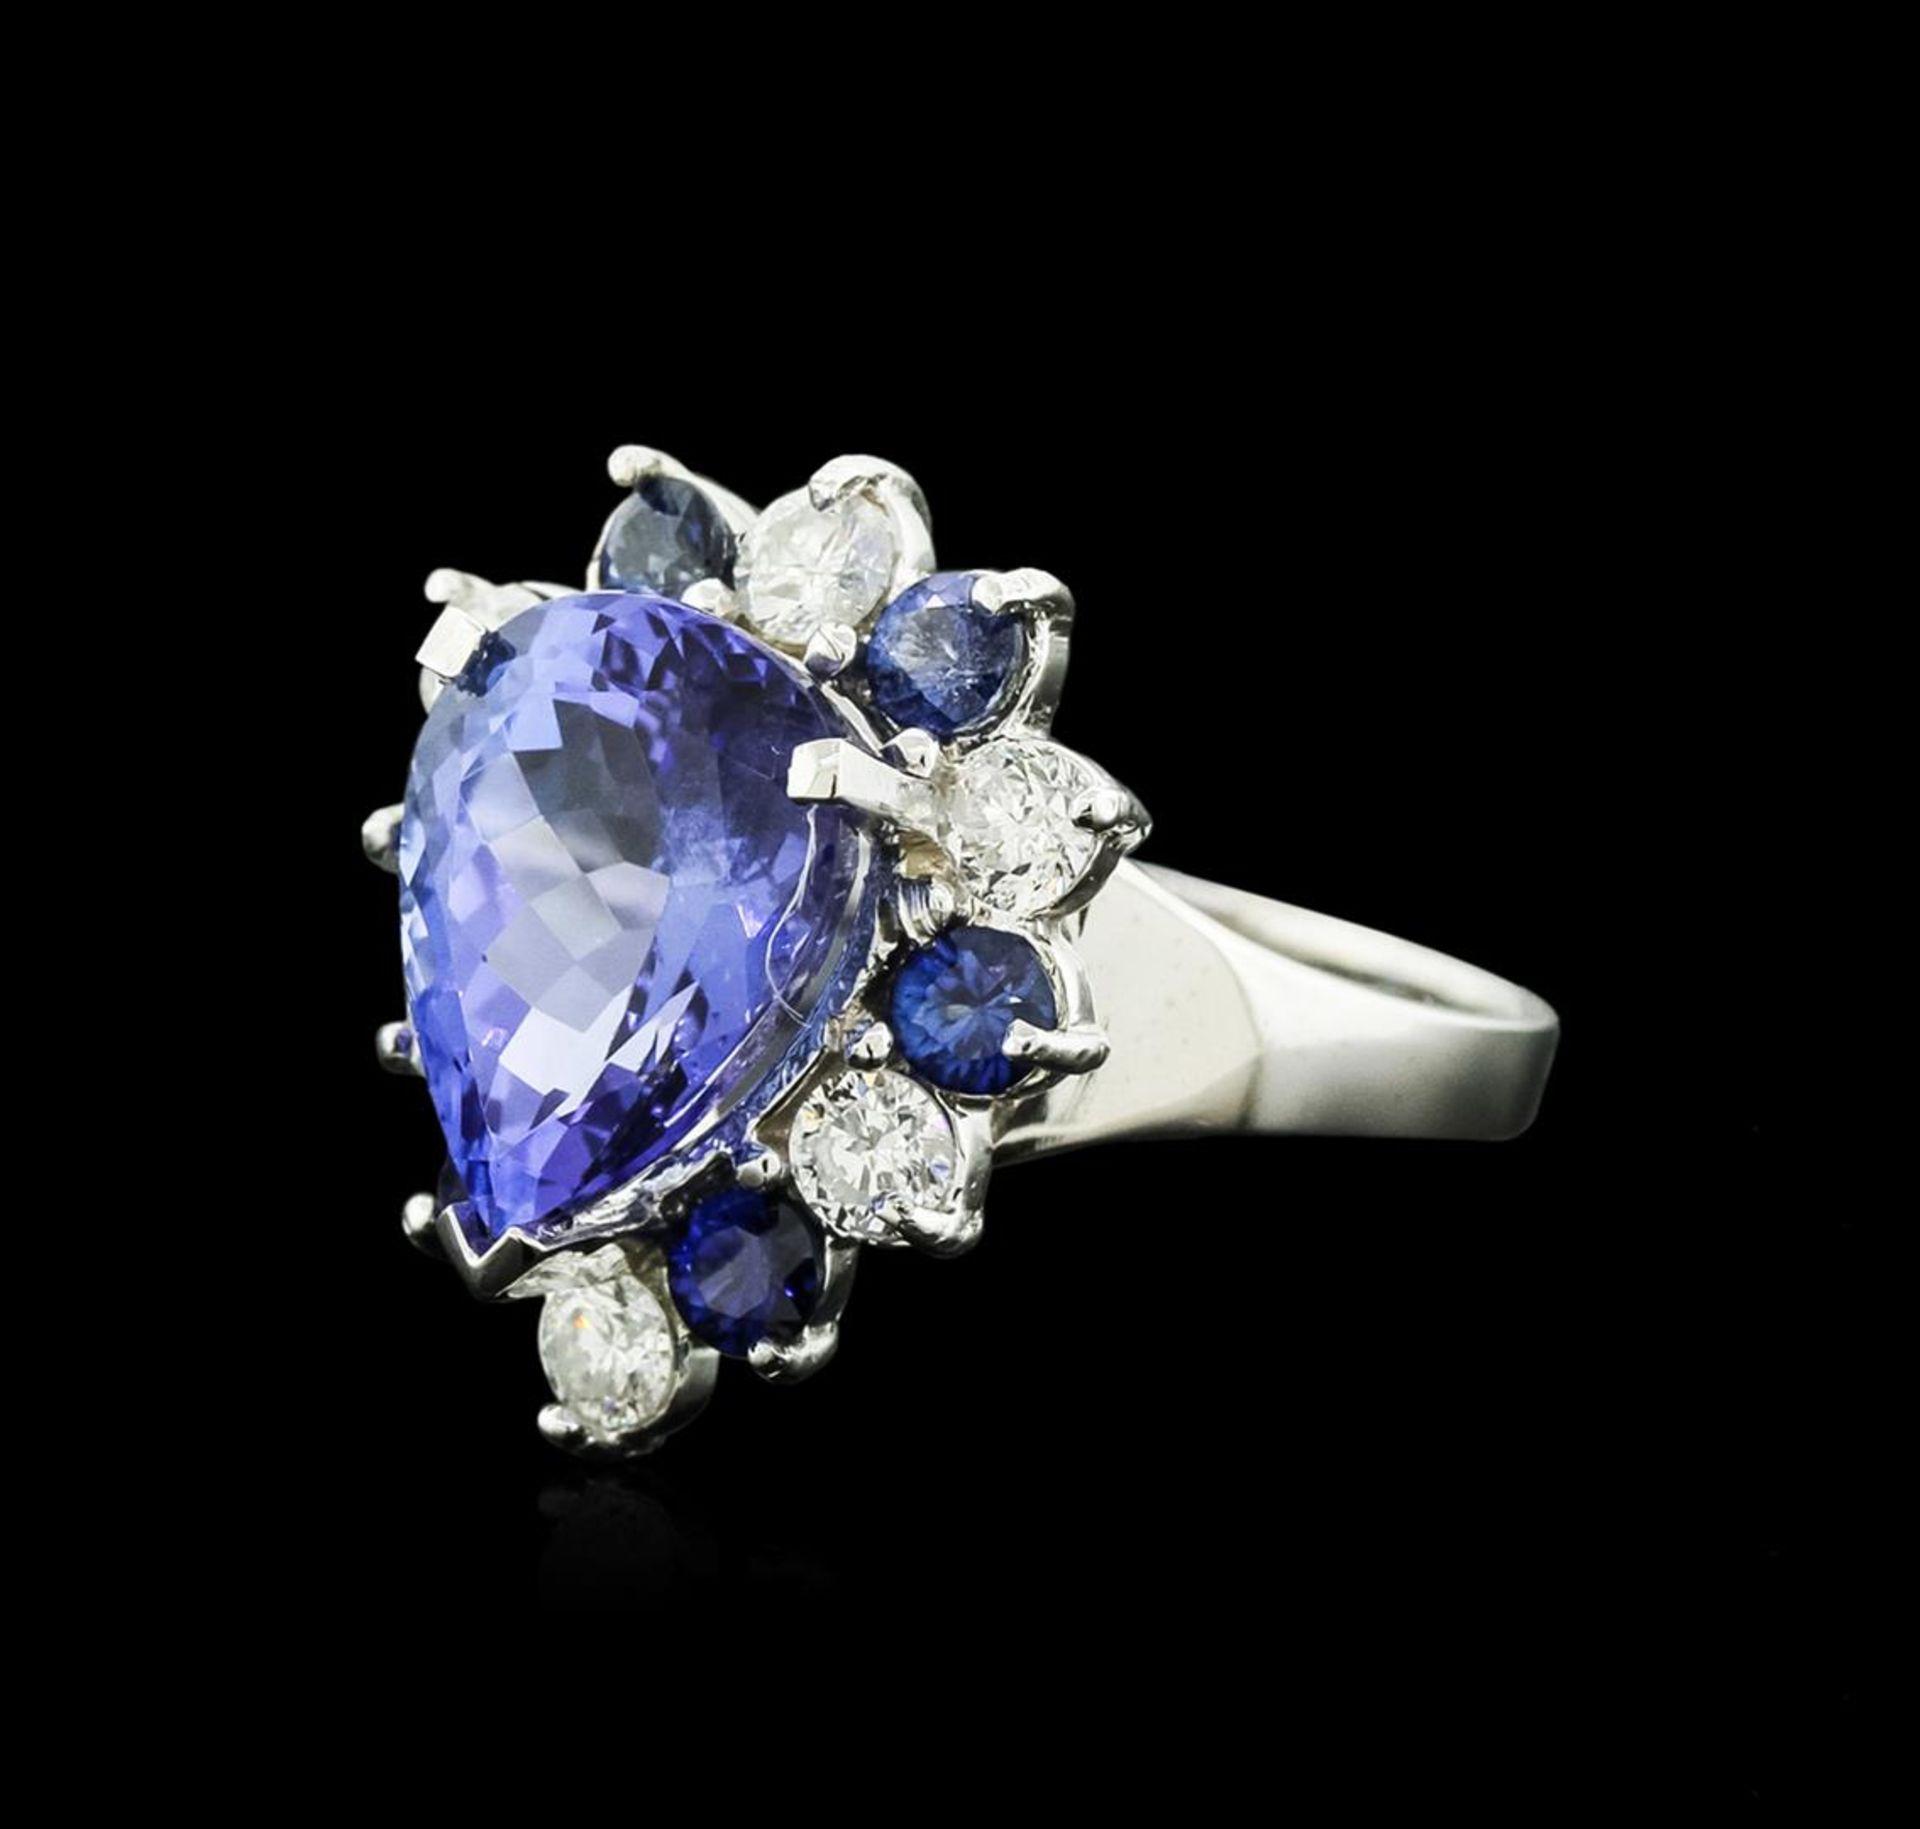 14KT White Gold 4.80 ctw Tanzanite, Sapphire and Diamond Ring - Image 2 of 4